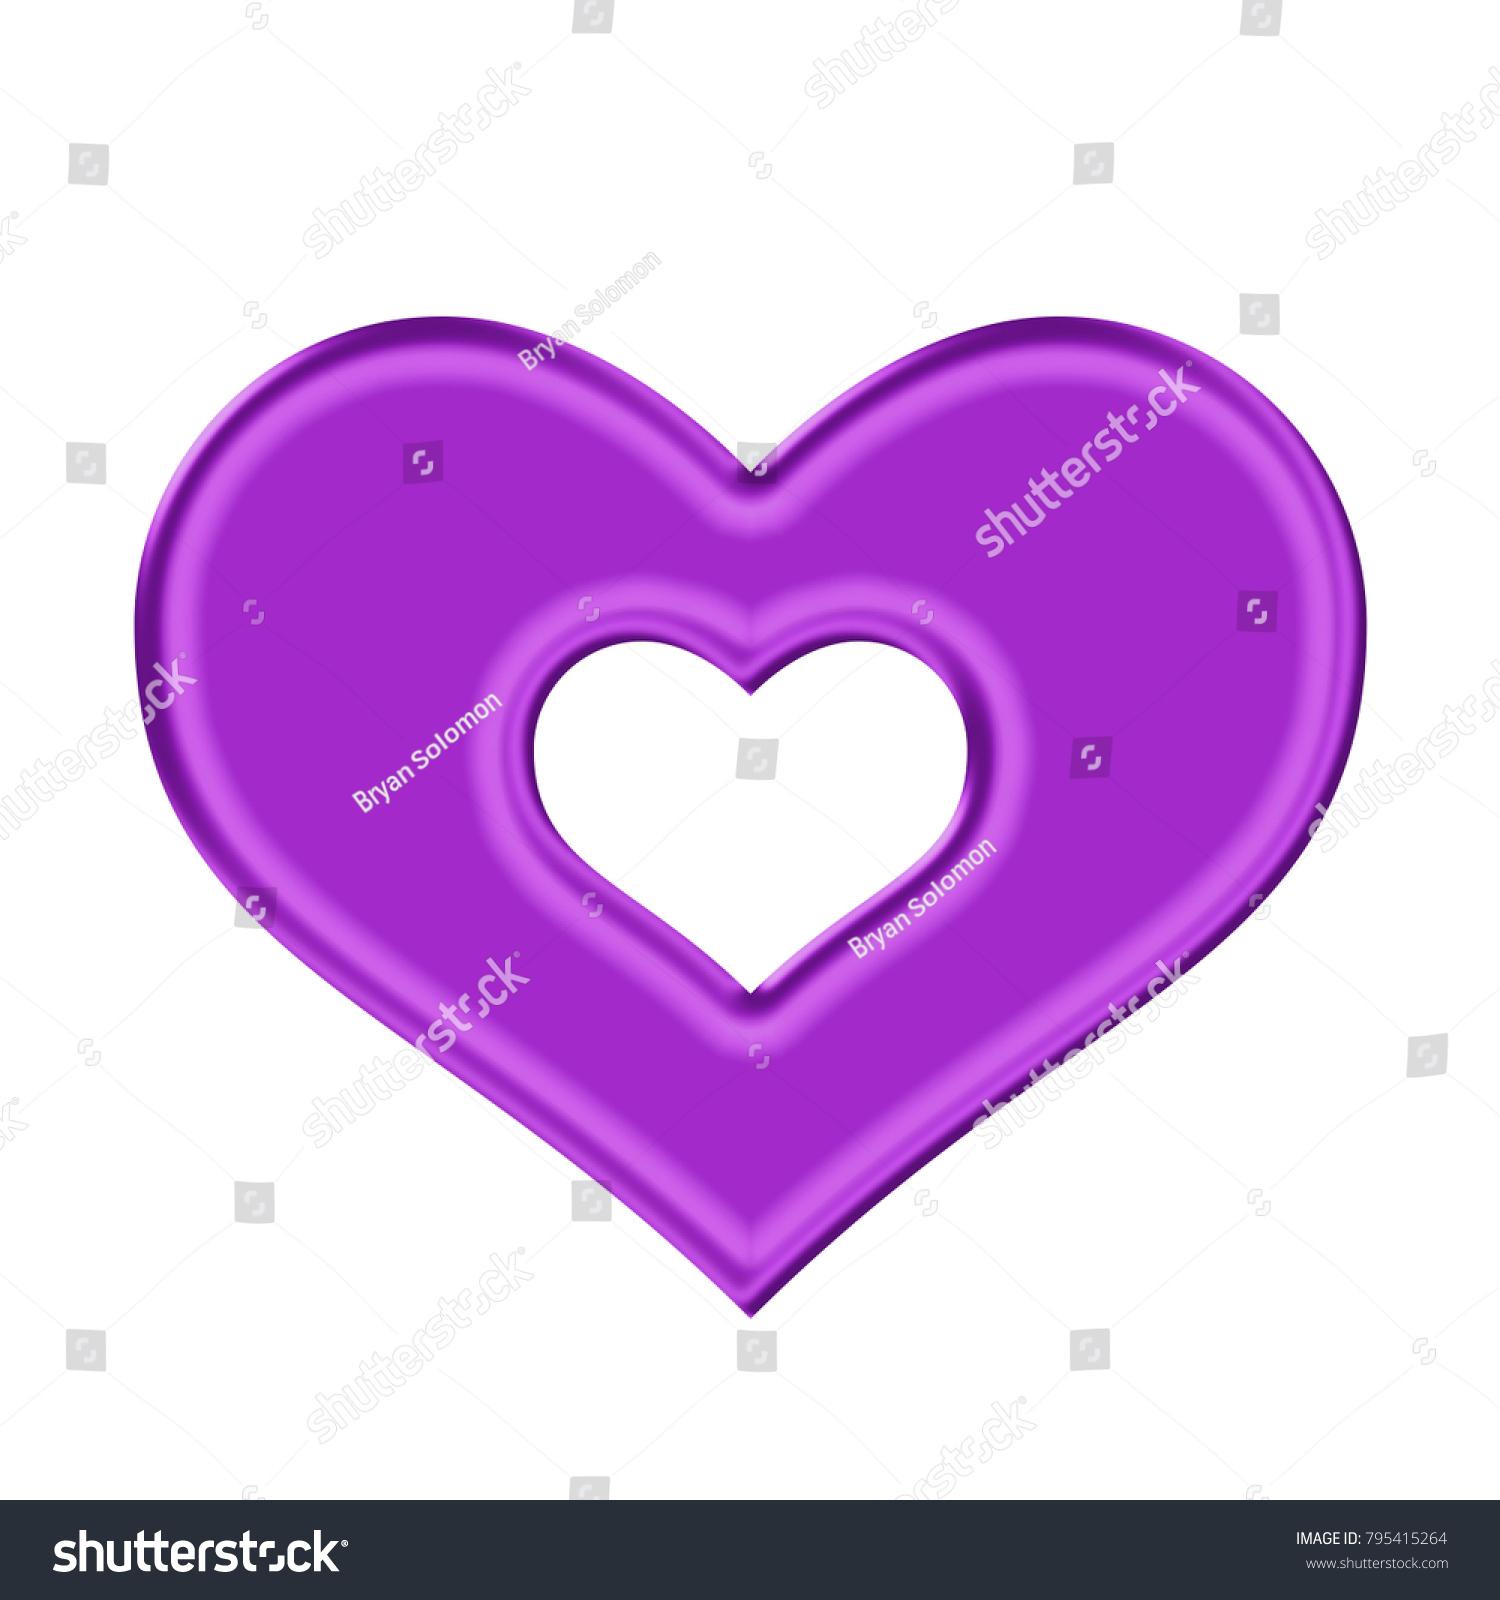 Shiny silky purple heart inner heart stock illustration 795415264 shiny silky purple heart with inner heart shape in a 3d illustration with a silk style buycottarizona